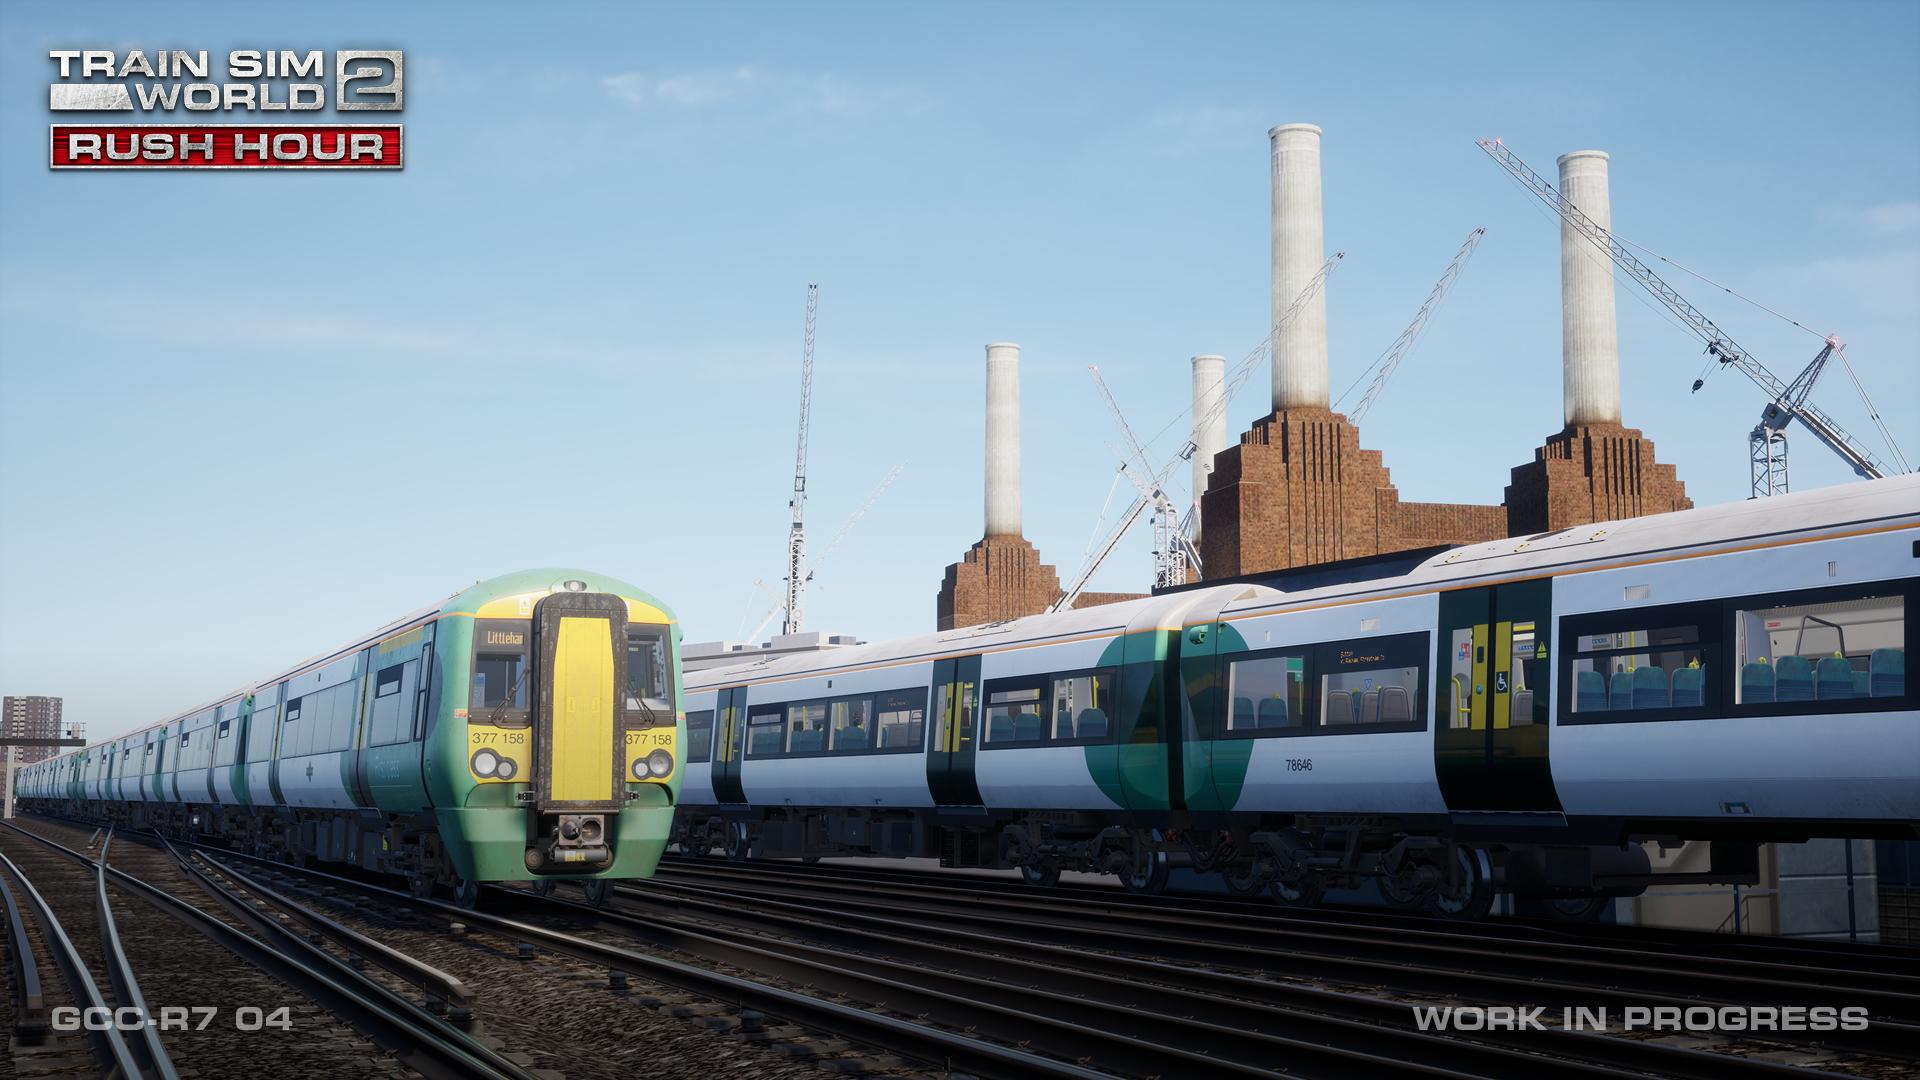 TSW2_RushHour_LondonCommuter_firstscreens6.jpg